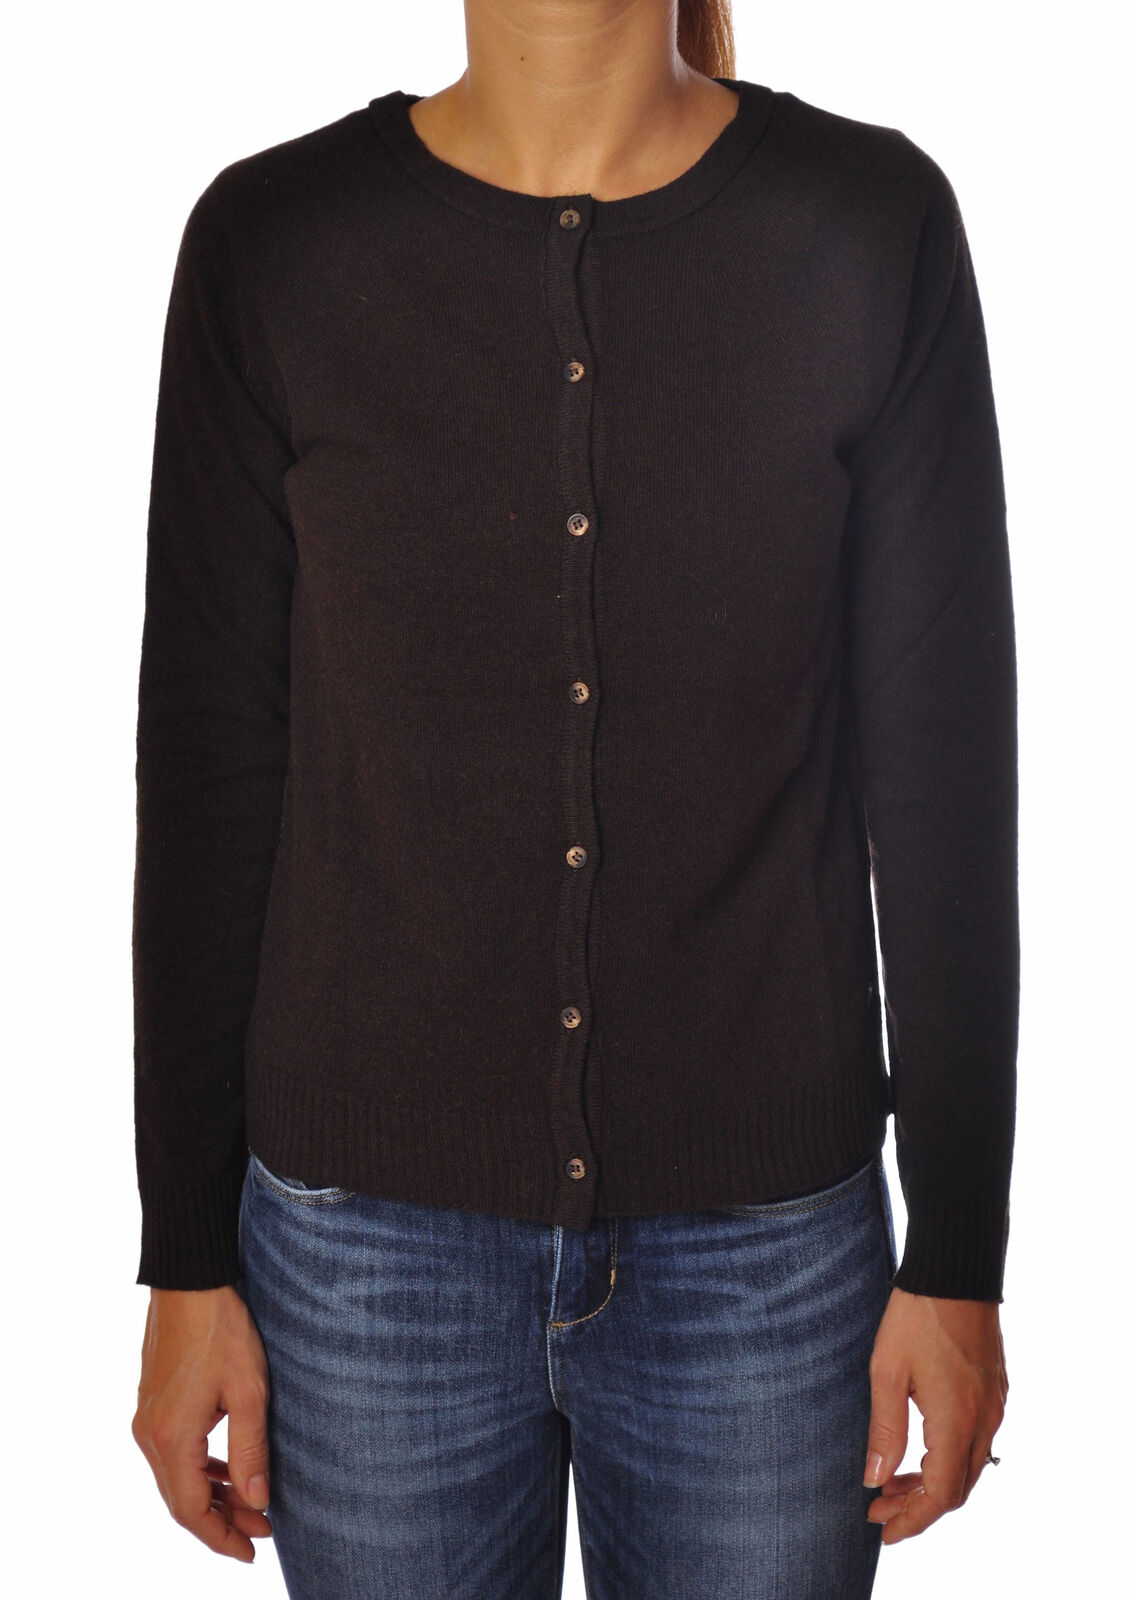 Ottod'ame - Knitwear-Cardigan - Woman - Brown - 2467722B184030